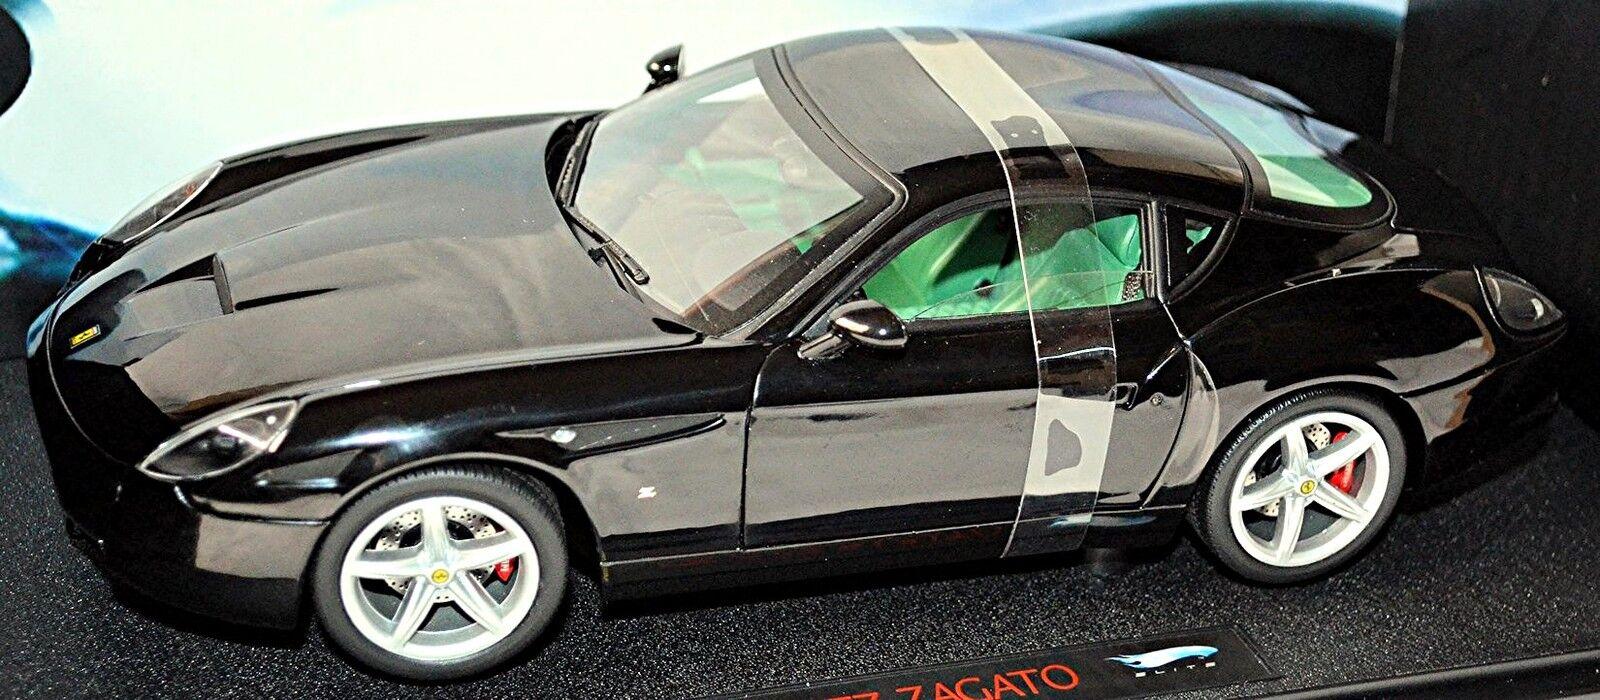 Ferrari 575 GTZ Zagato 2006 black black 1 18 HotWheels-Elite